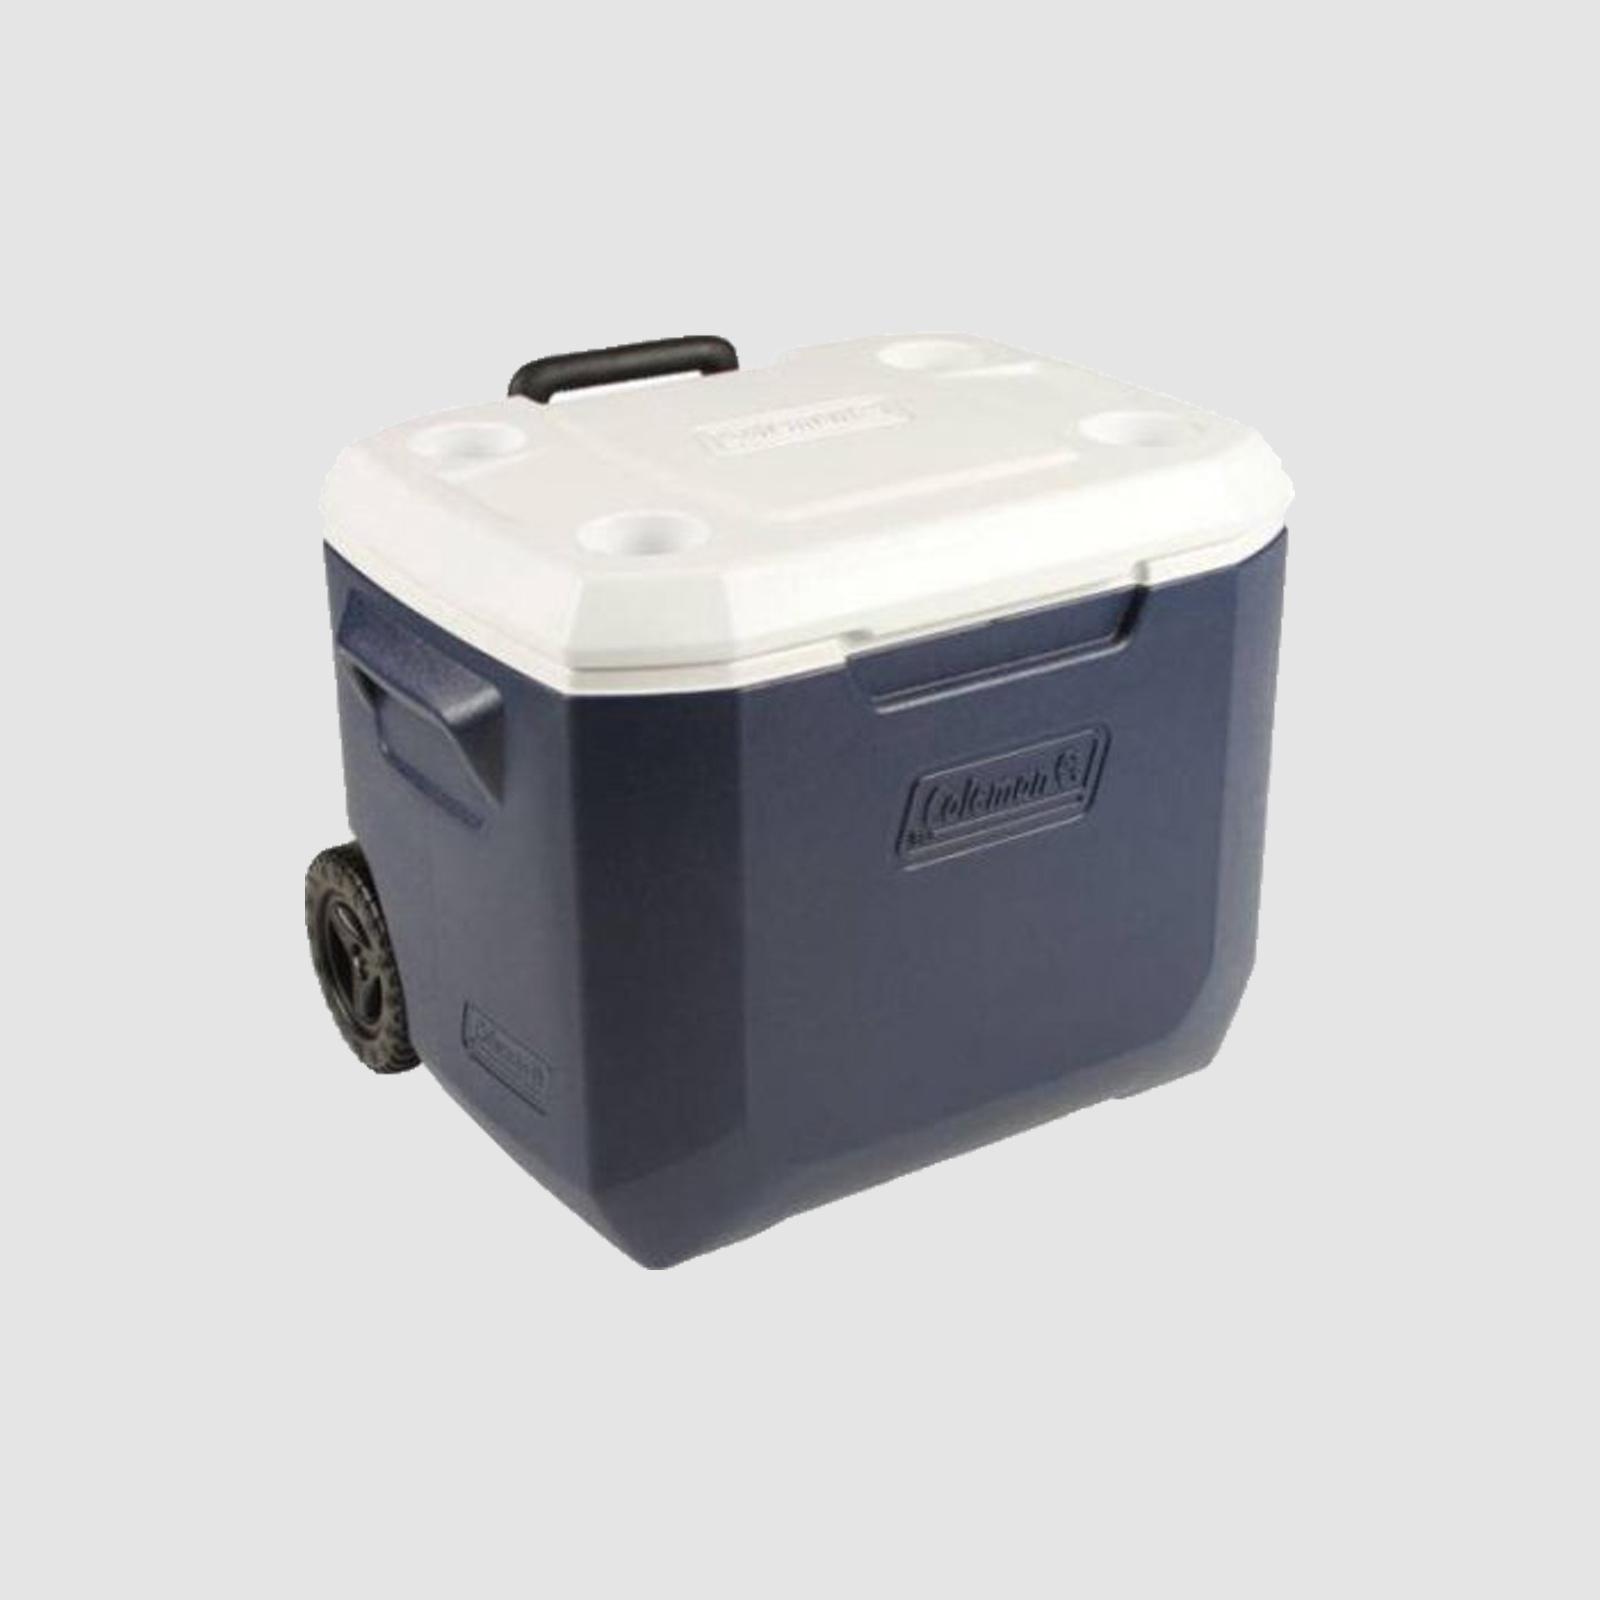 Coleman Xtreme 50-Quart Wheeled Cooler   $30   Walmart